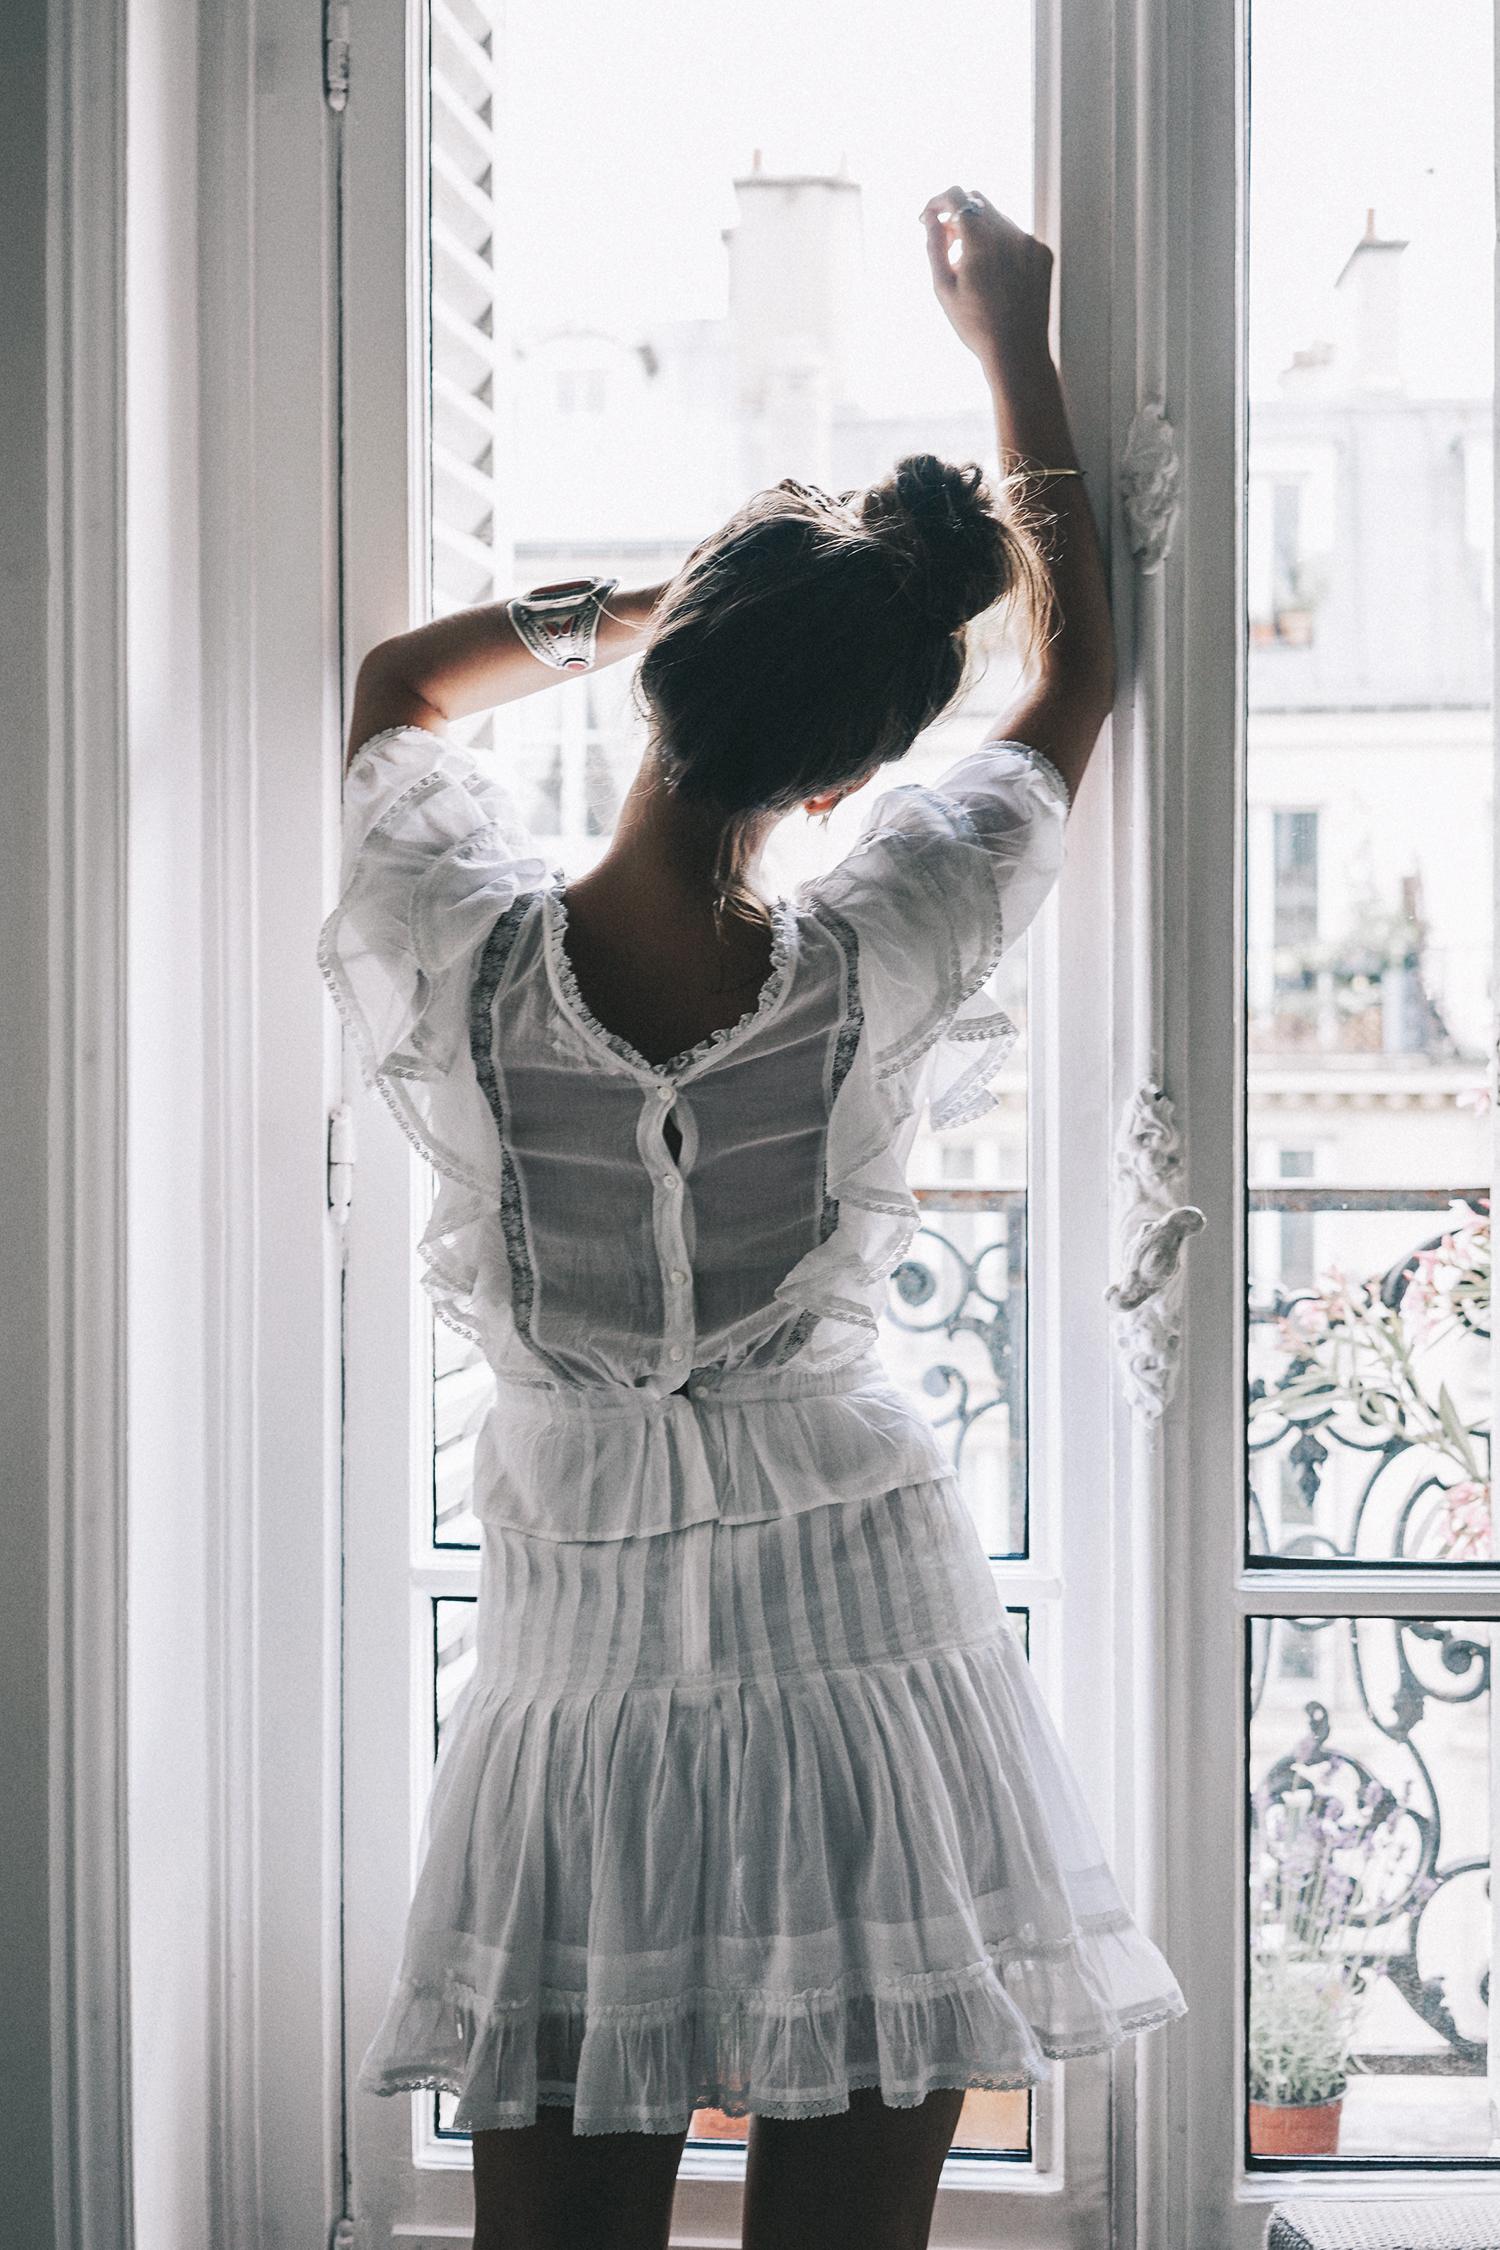 Home_Away-Isabel_Marant_Dress-Outfit-Paris-Collage_Vintage-47